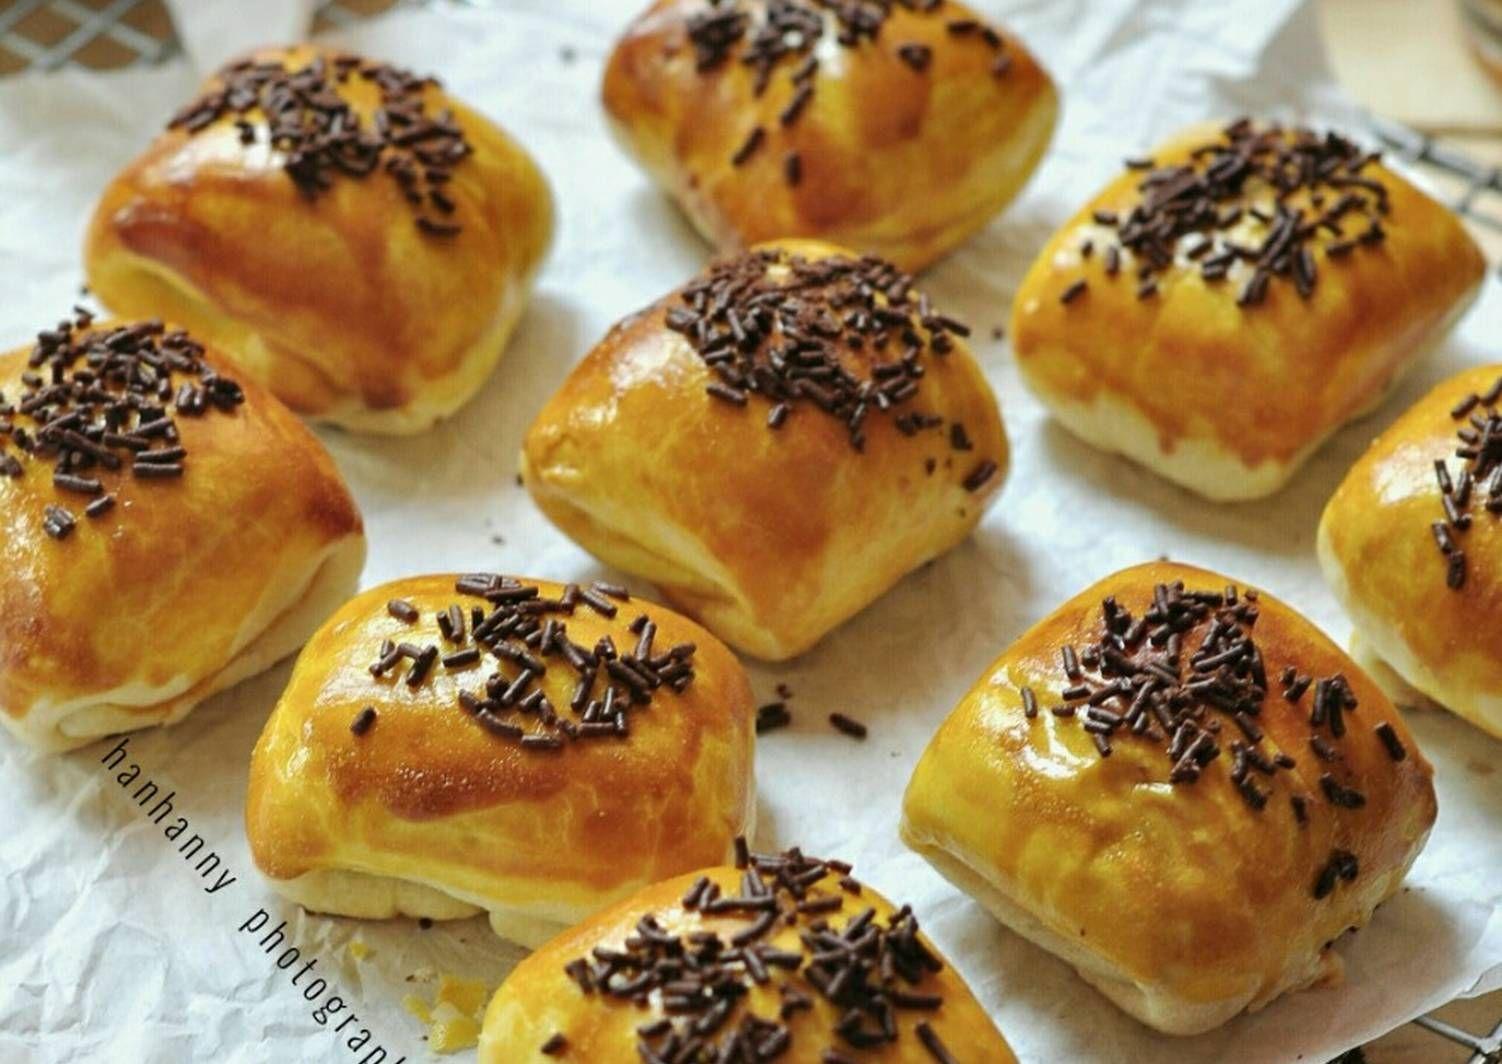 Resep Pisang Bolen Oleh Hanhanny Resep Resep Ide Makanan Pudding Desserts